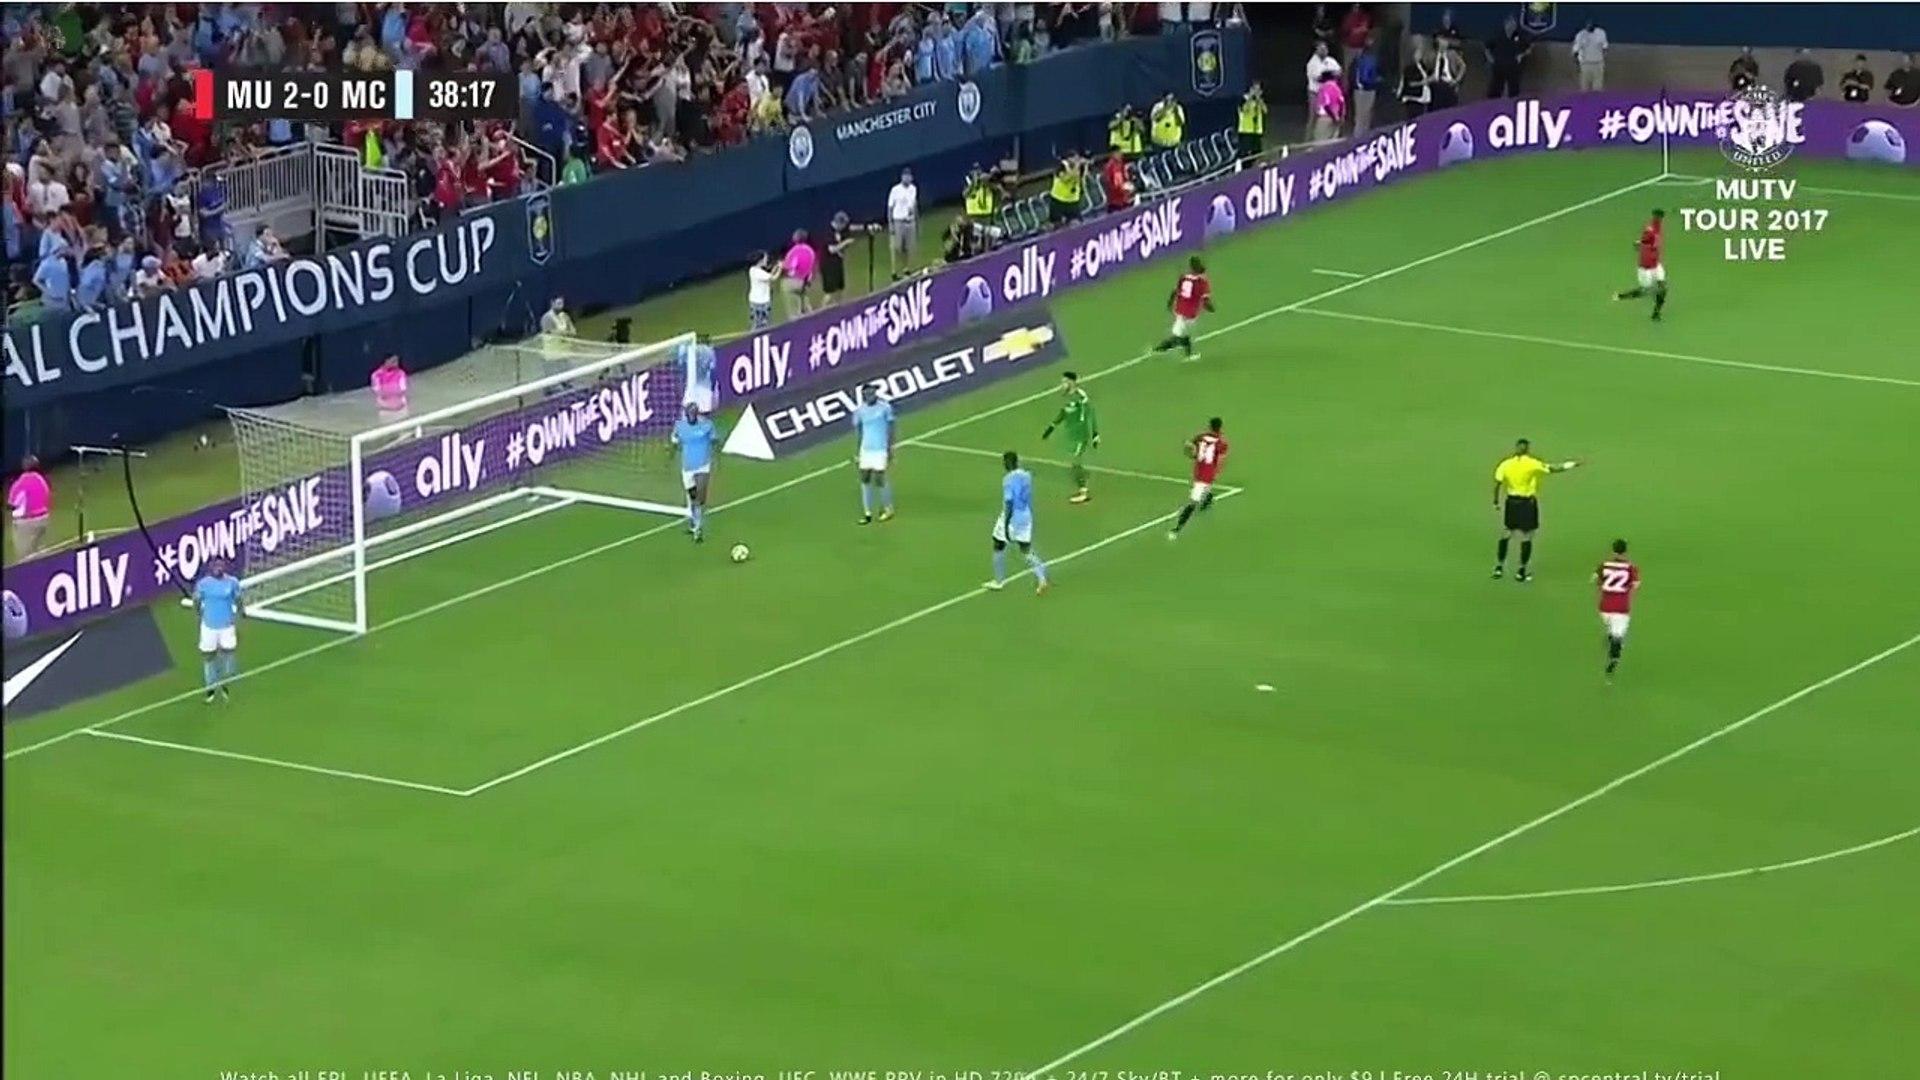 [ Full Replay ] - Marcus Rashford Goal 2-0 - Manchester United vs Manchester City July 21 2017